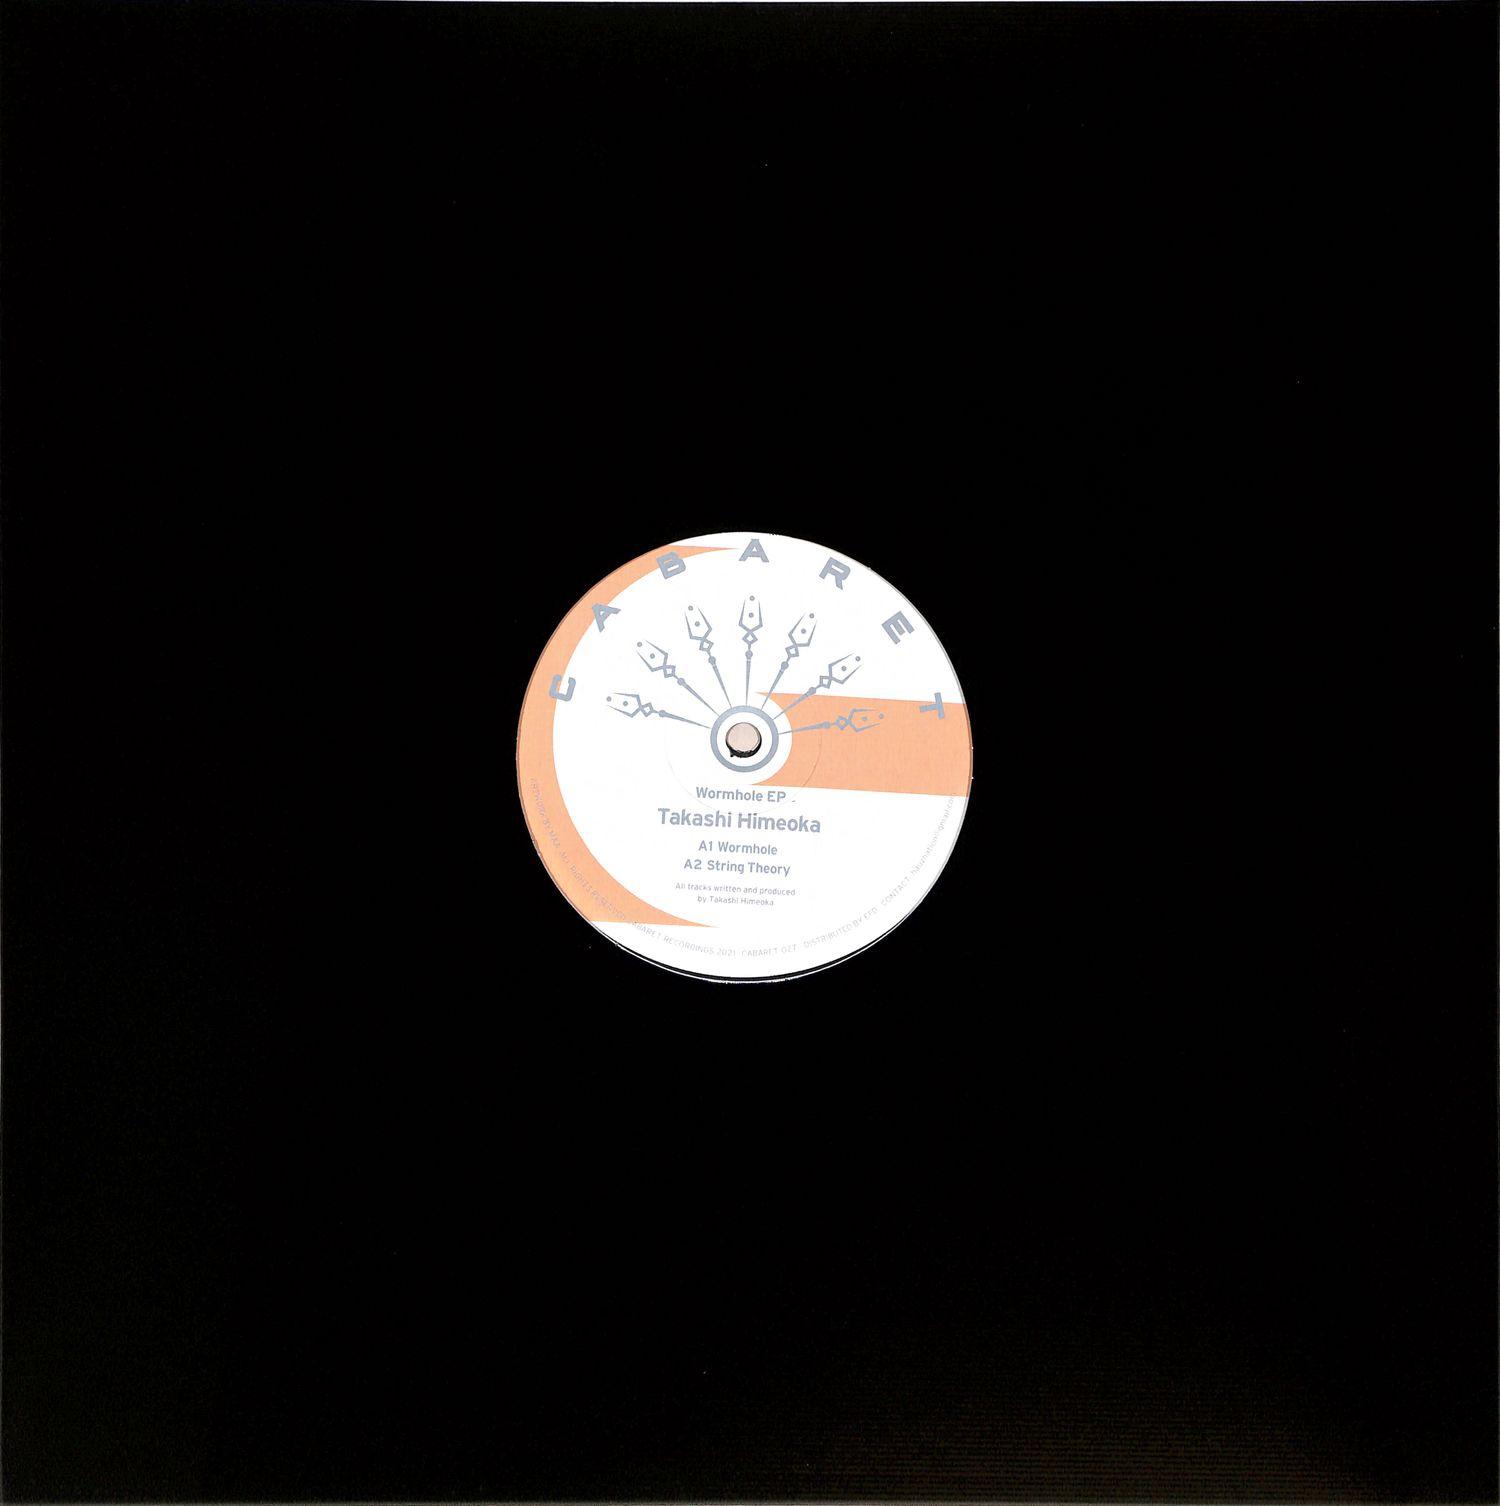 Takashi Himeoka - WORMHOLE EP